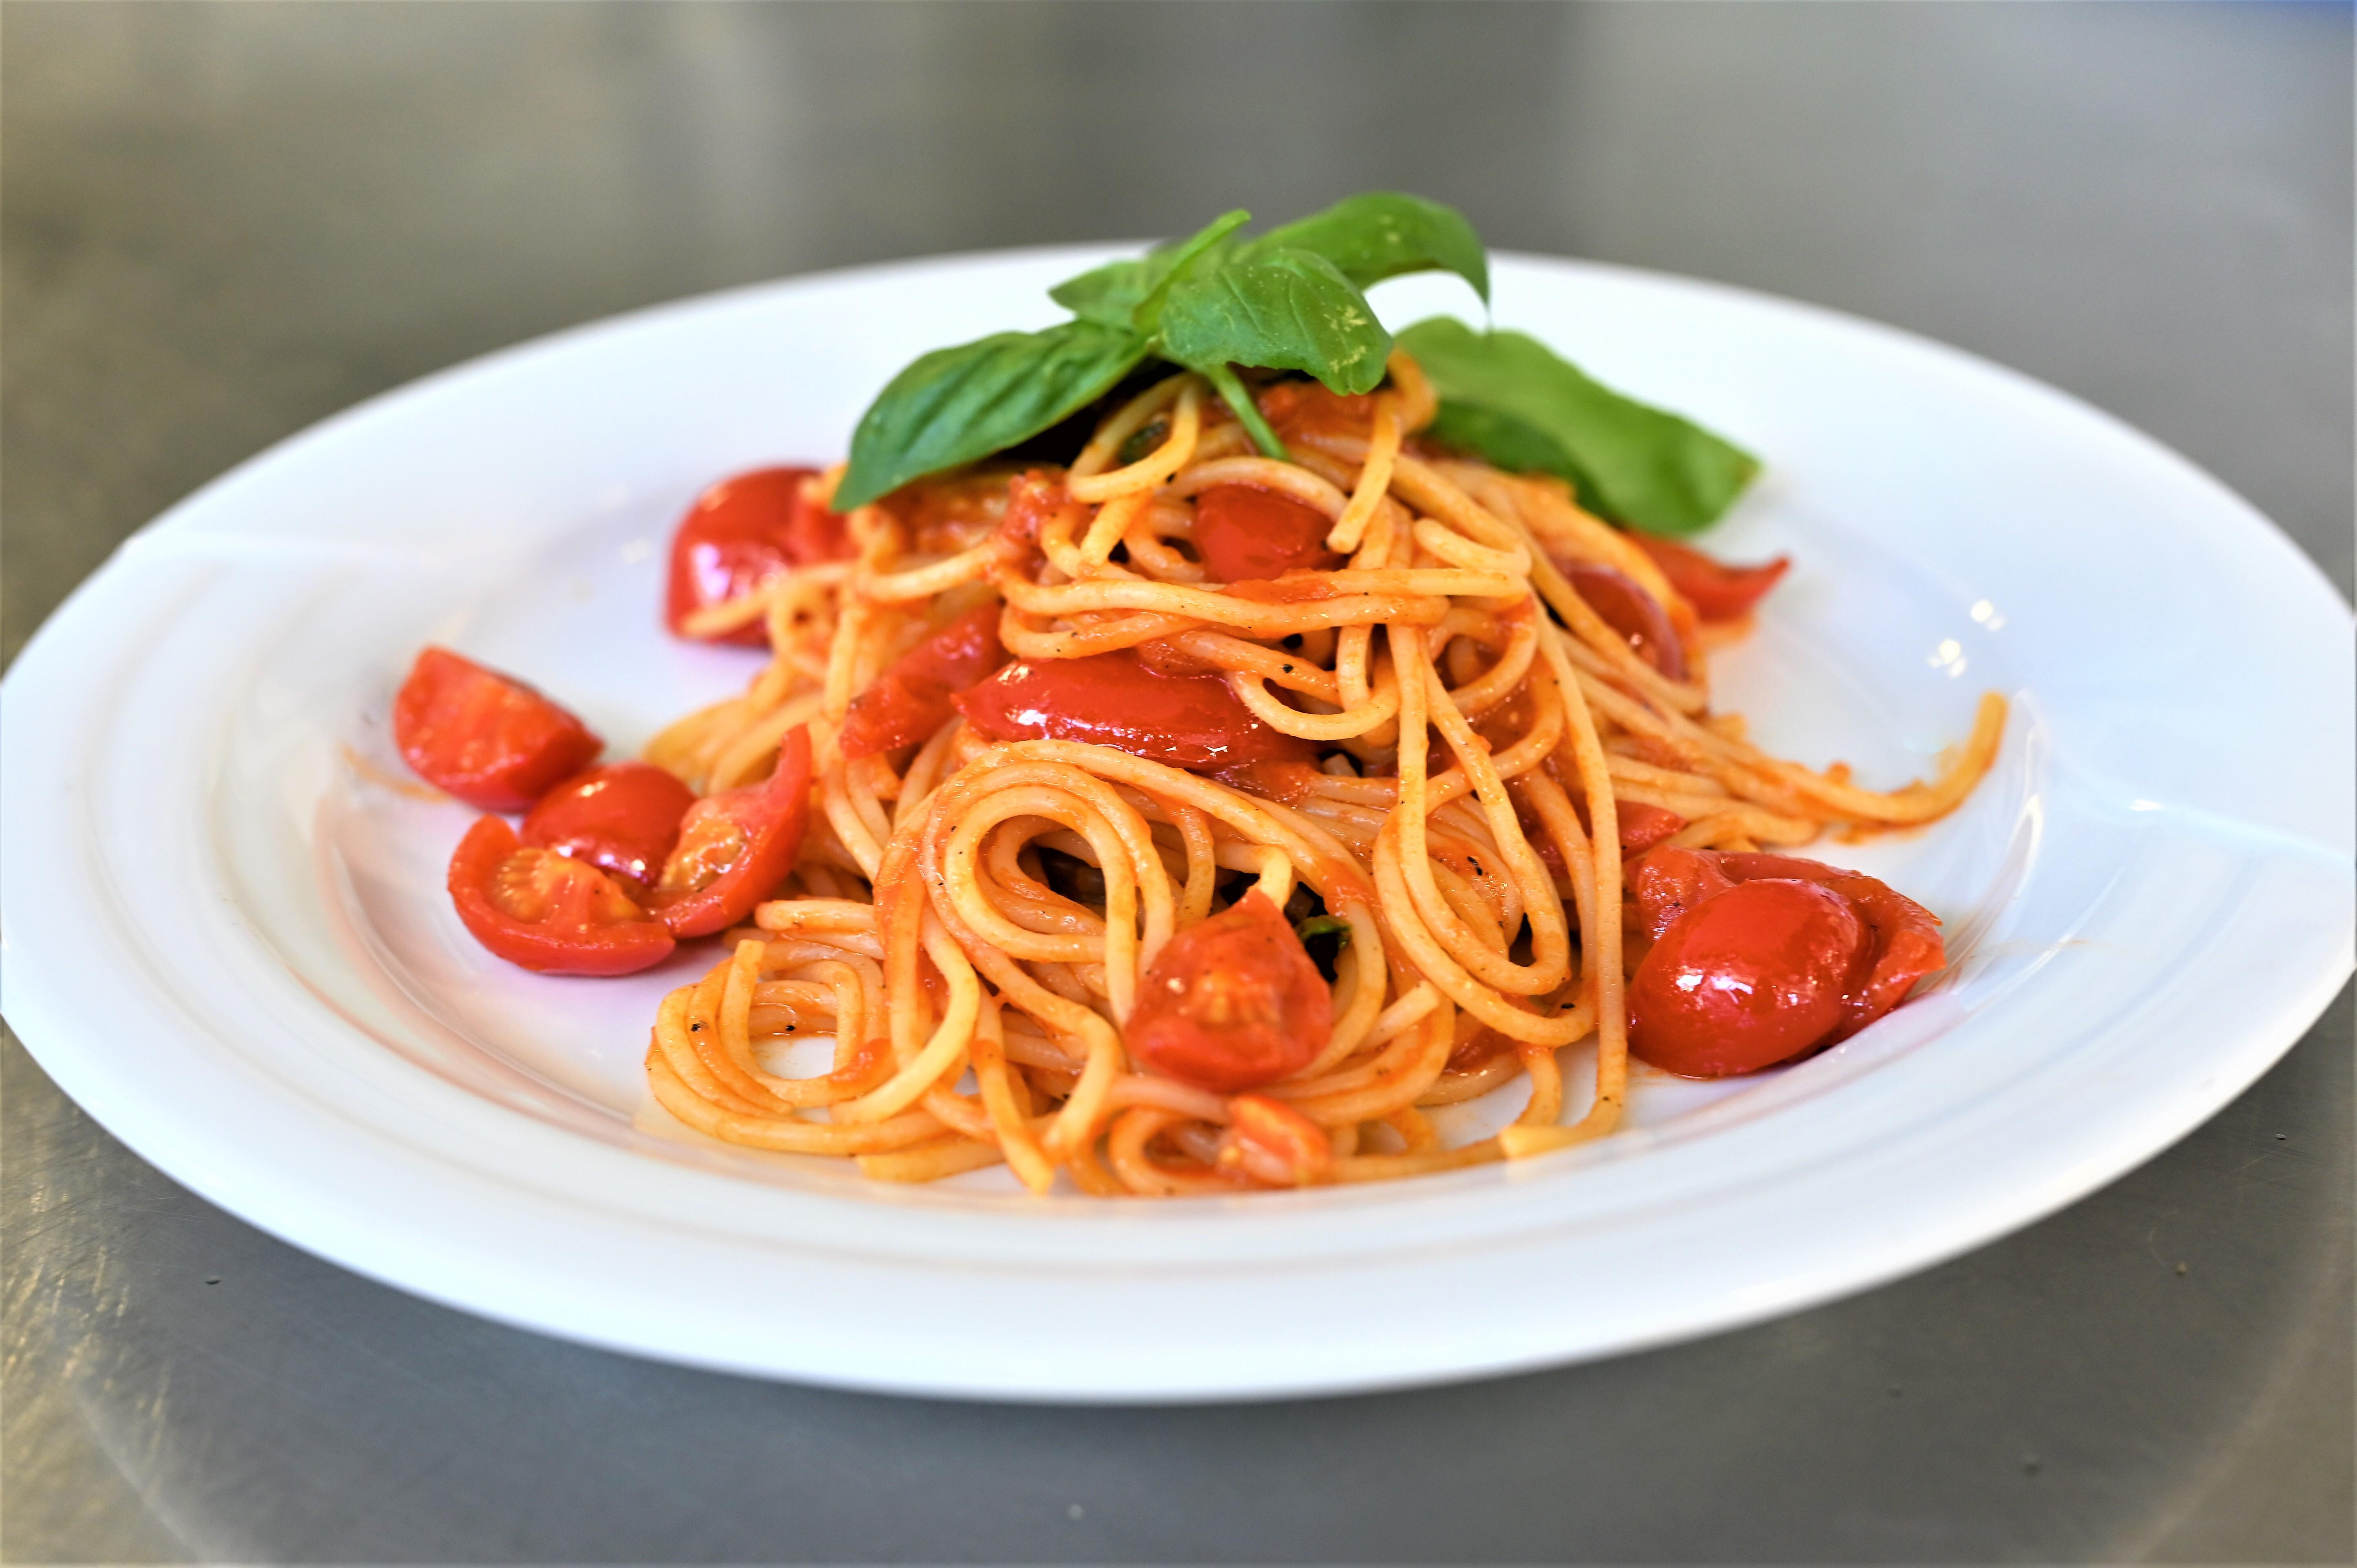 Spaghetti con pomooro fresco e basilico